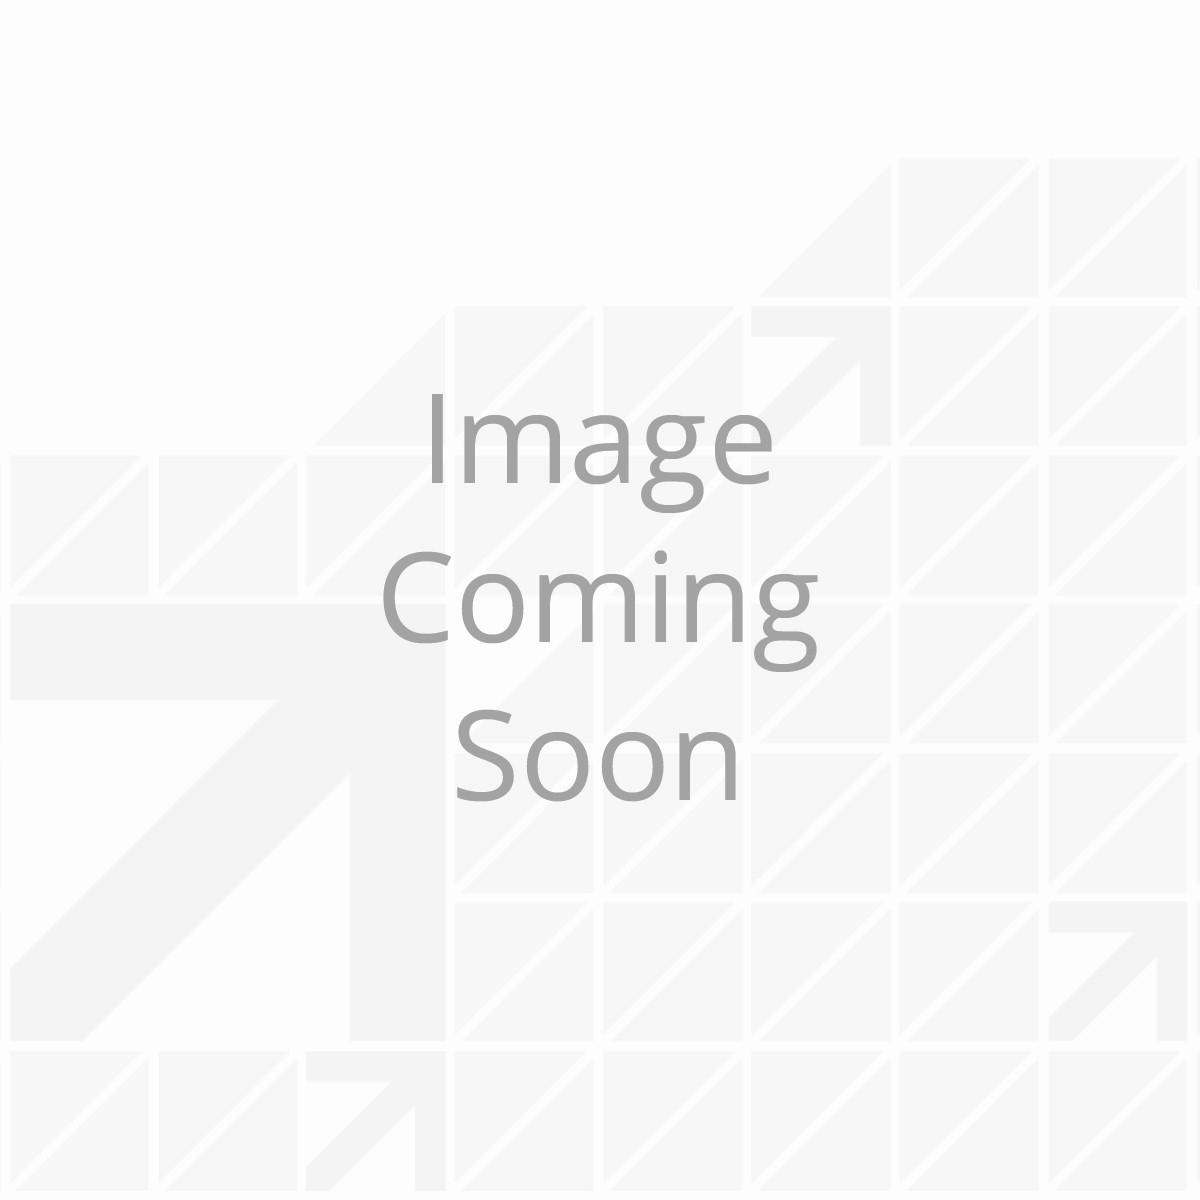 Let's Go Aero®  Bike Carriers Promo Block Image